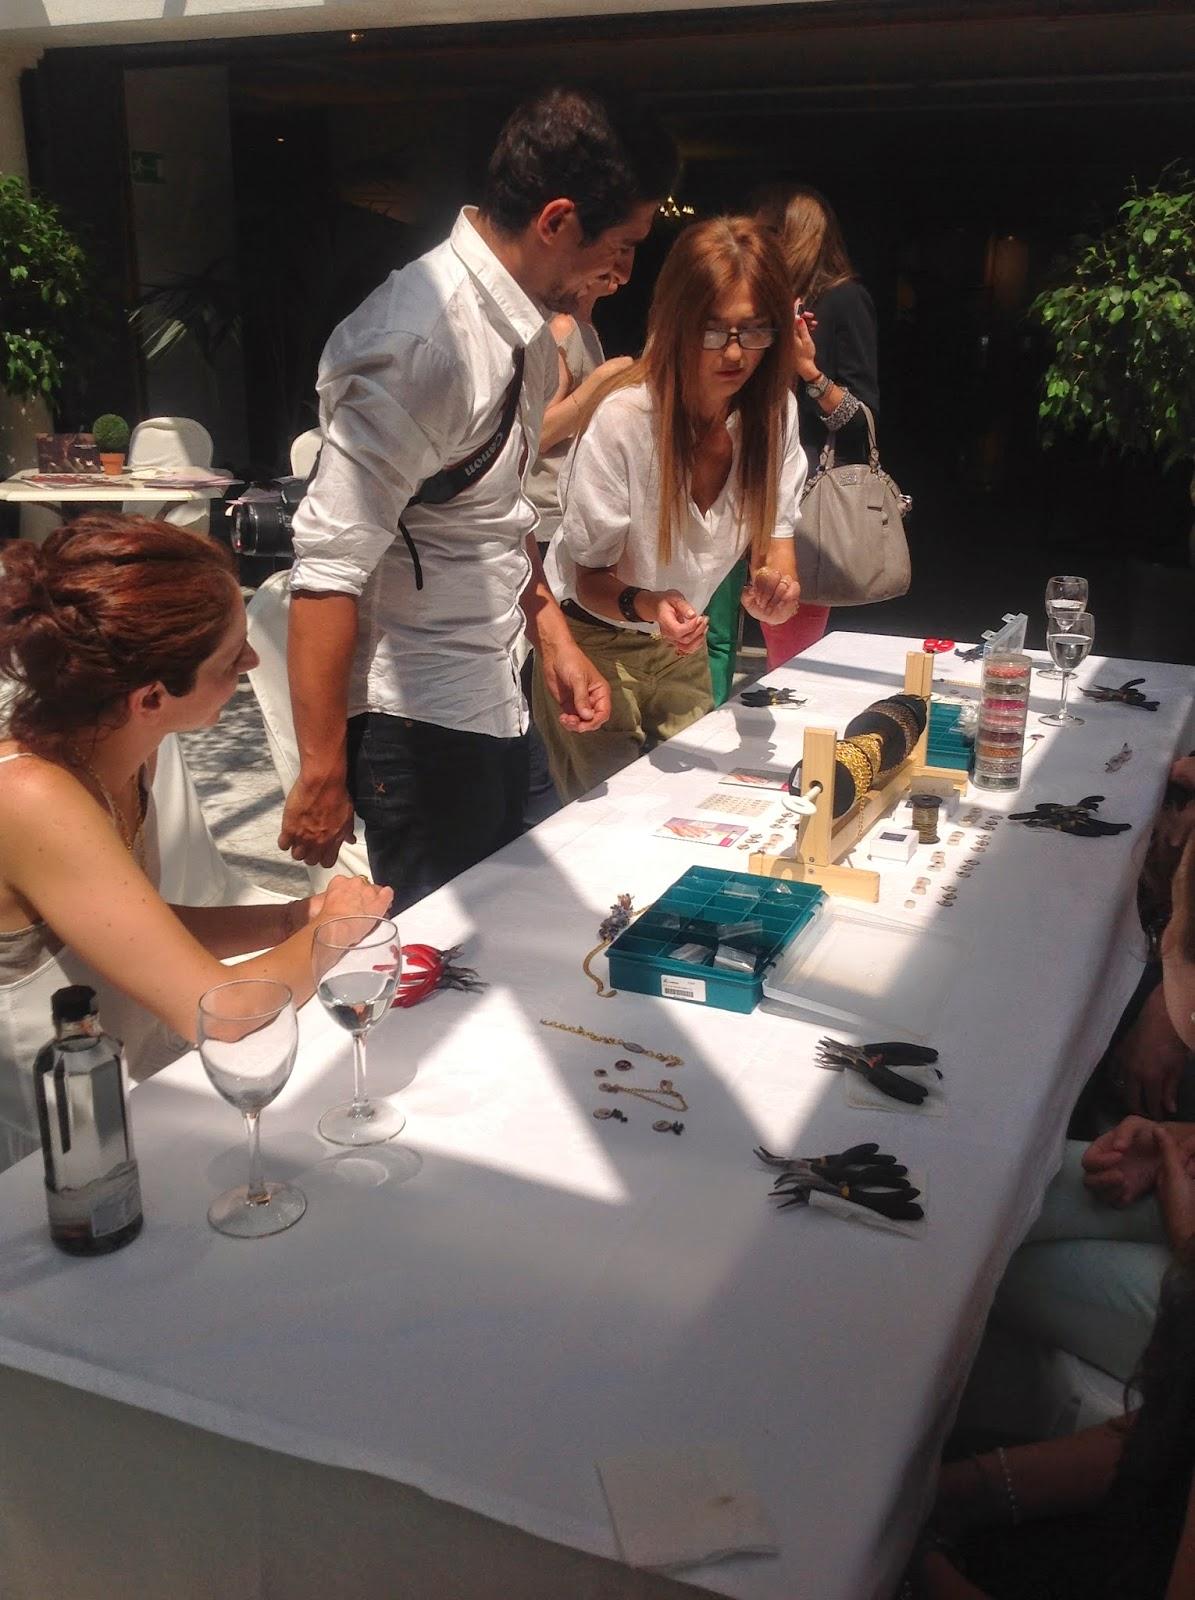 Evento, SModa, Ginger & Velvet, Bourjois, Hotel Miguel Ángel, belleza, moda, complementos, joyeria, street style, fashion style, life style, Carmen Hummer